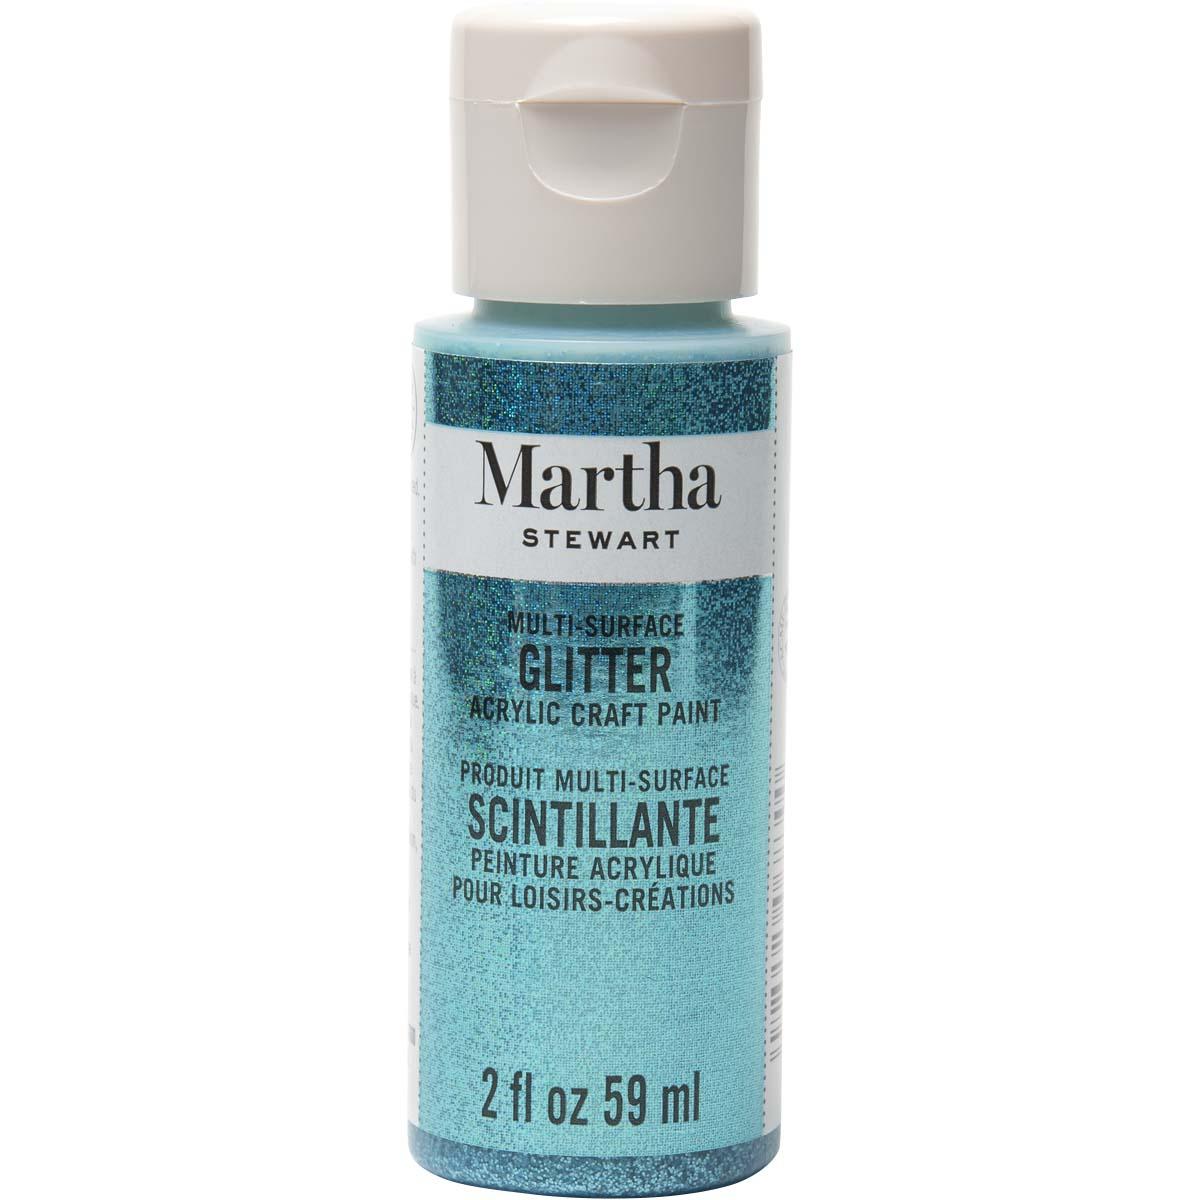 Martha Stewart ® Multi-Surface Glitter Acrylic Craft Paint - Turquoise, 2 oz. - 32157CA